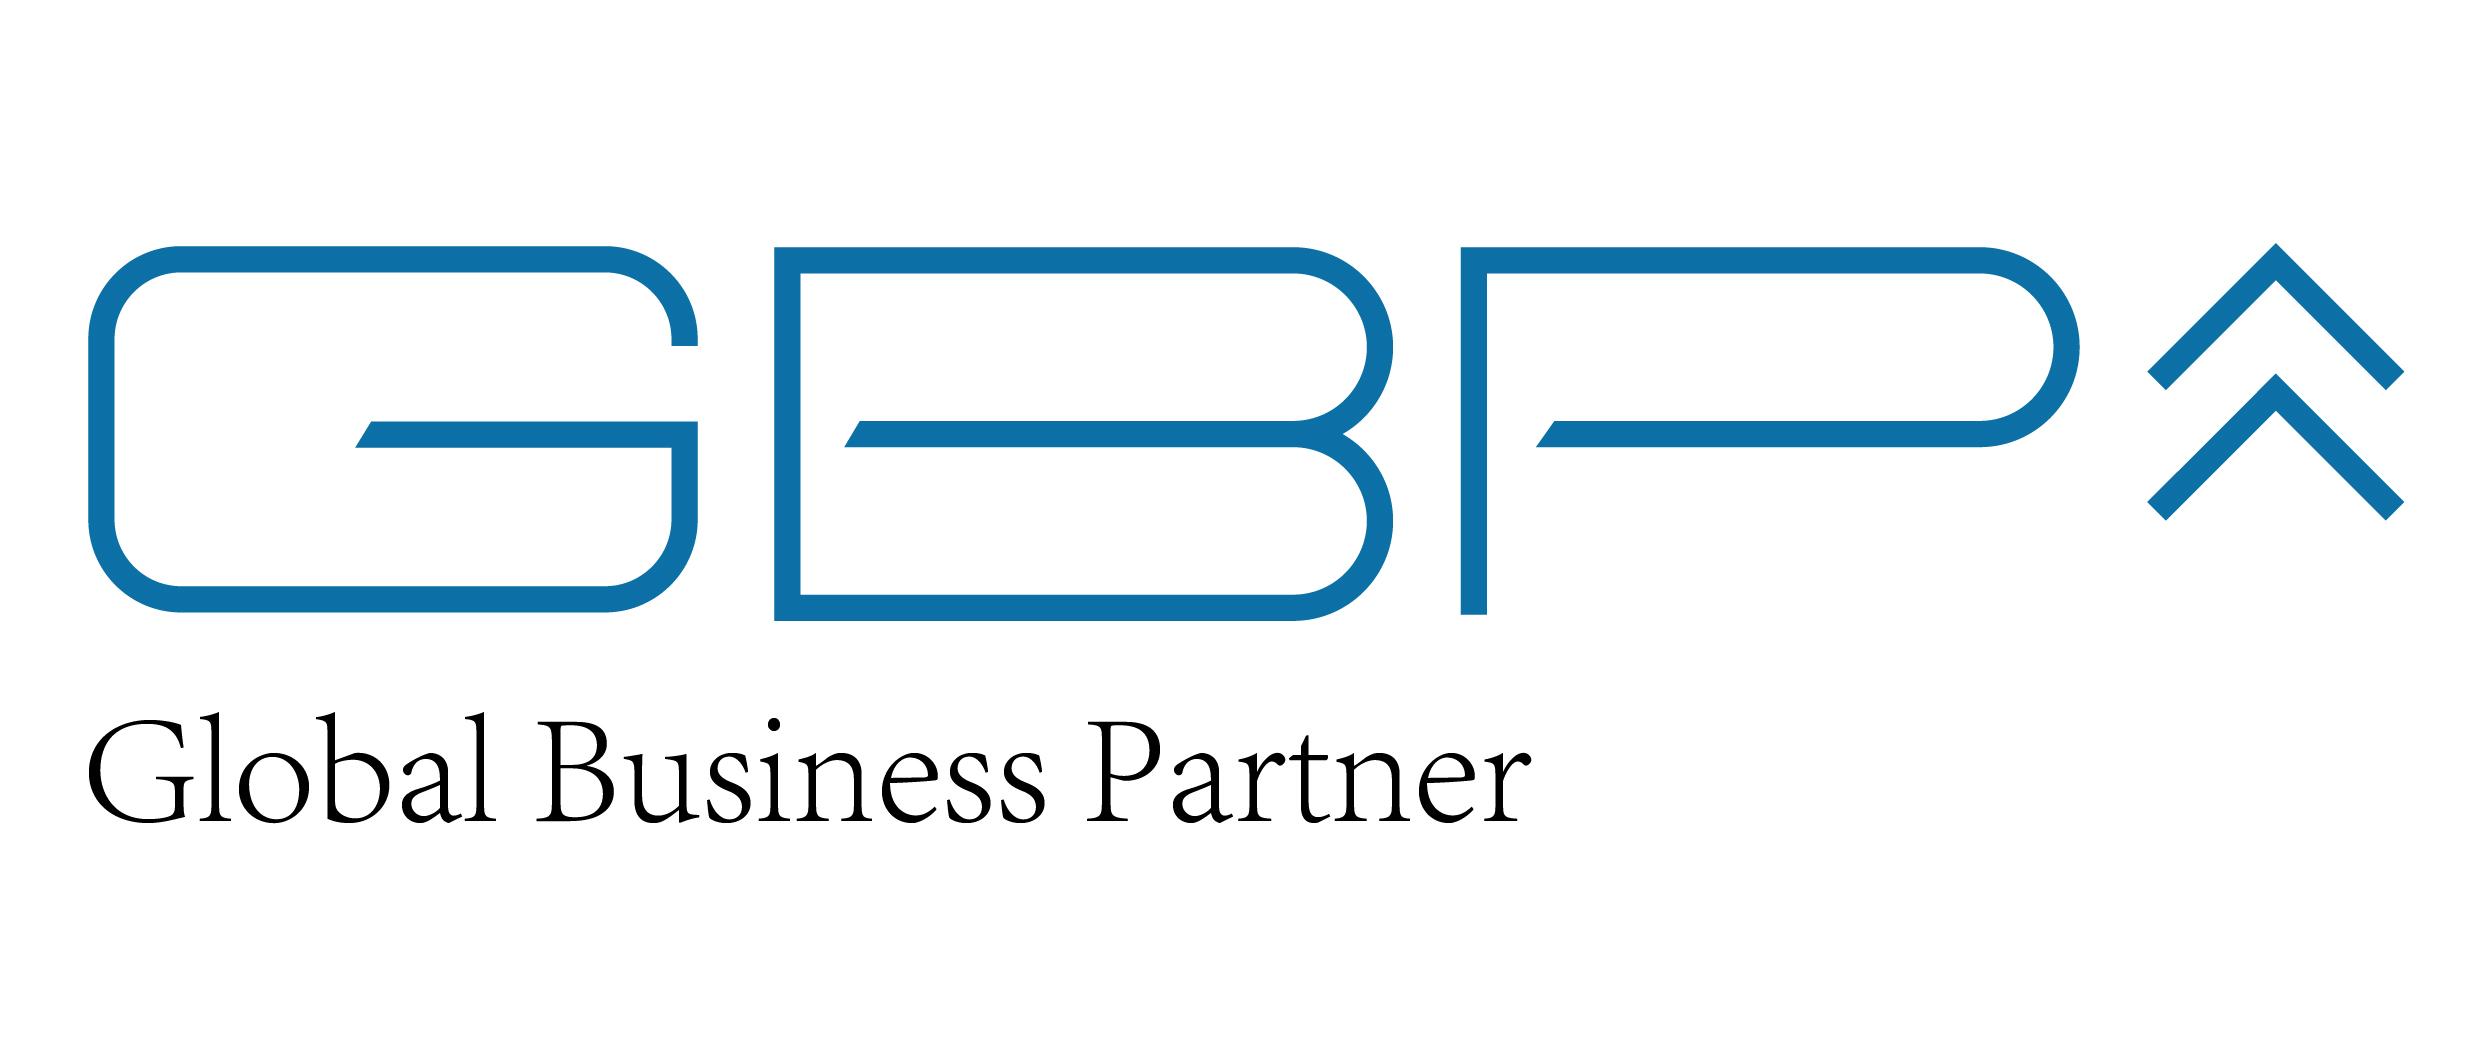 GBP株式会社